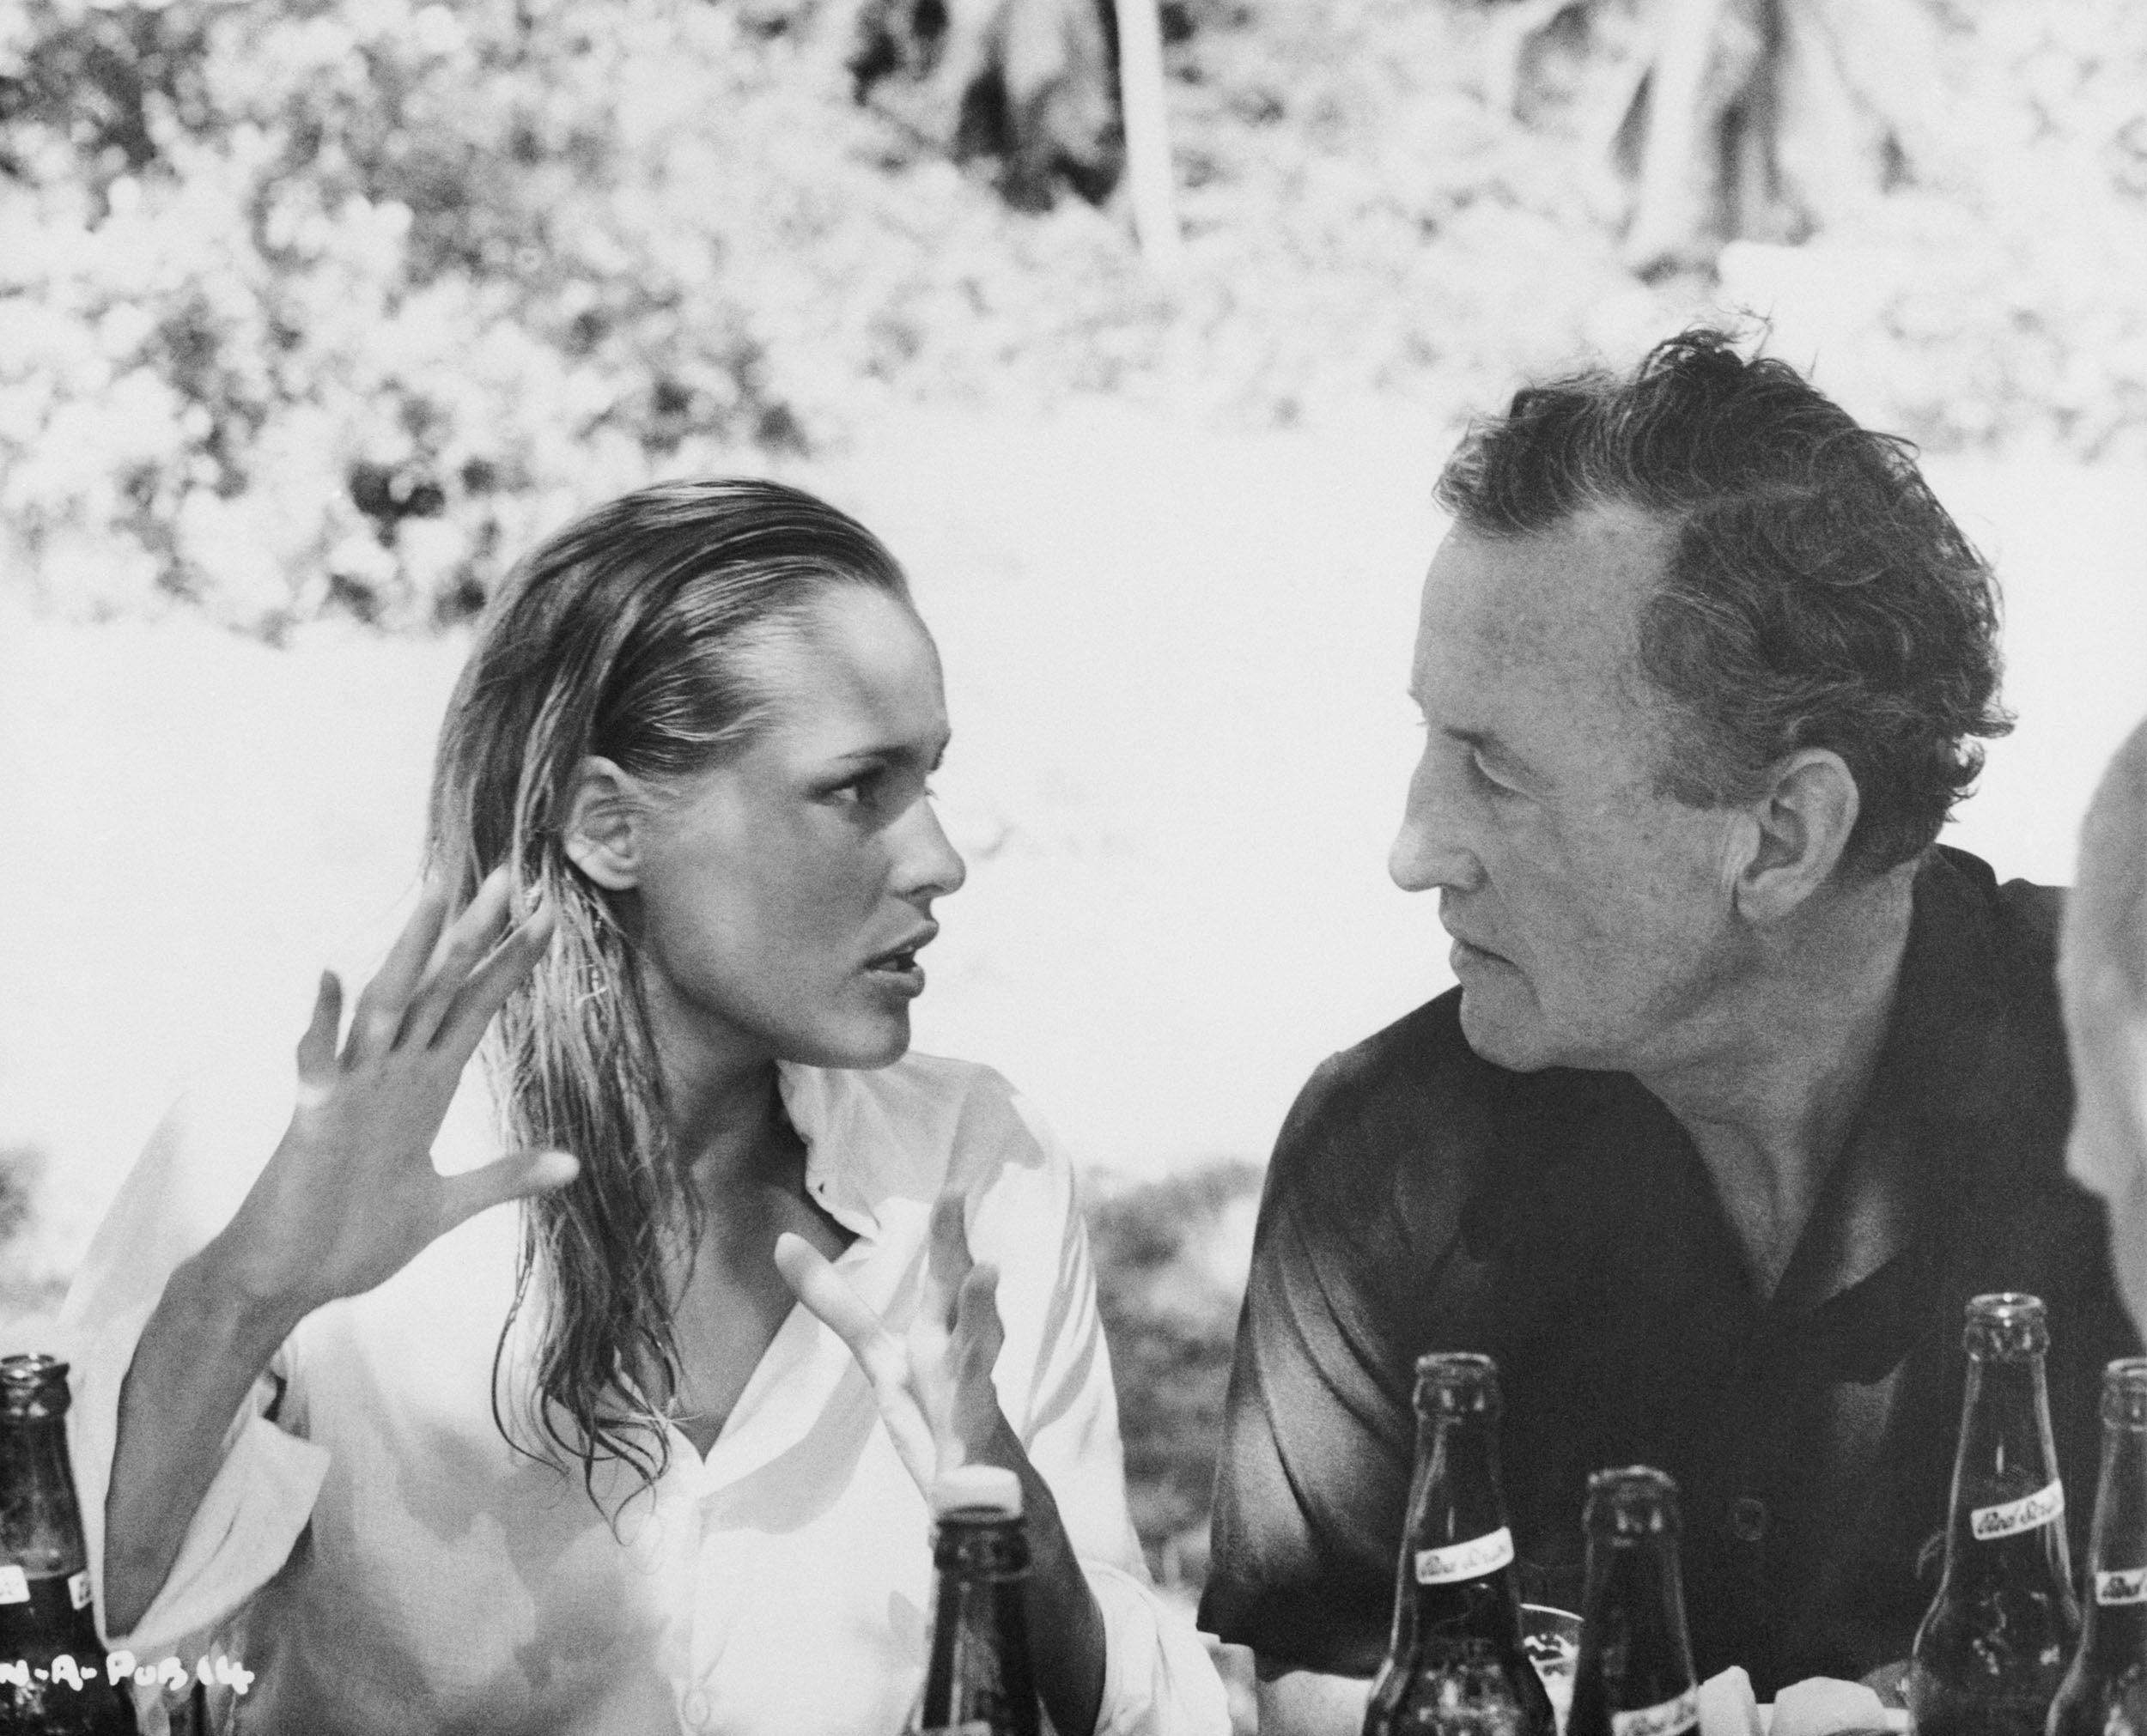 James Bond creator Ian Fleming chats with actress Ursula Andress between scenes of Dr. No.